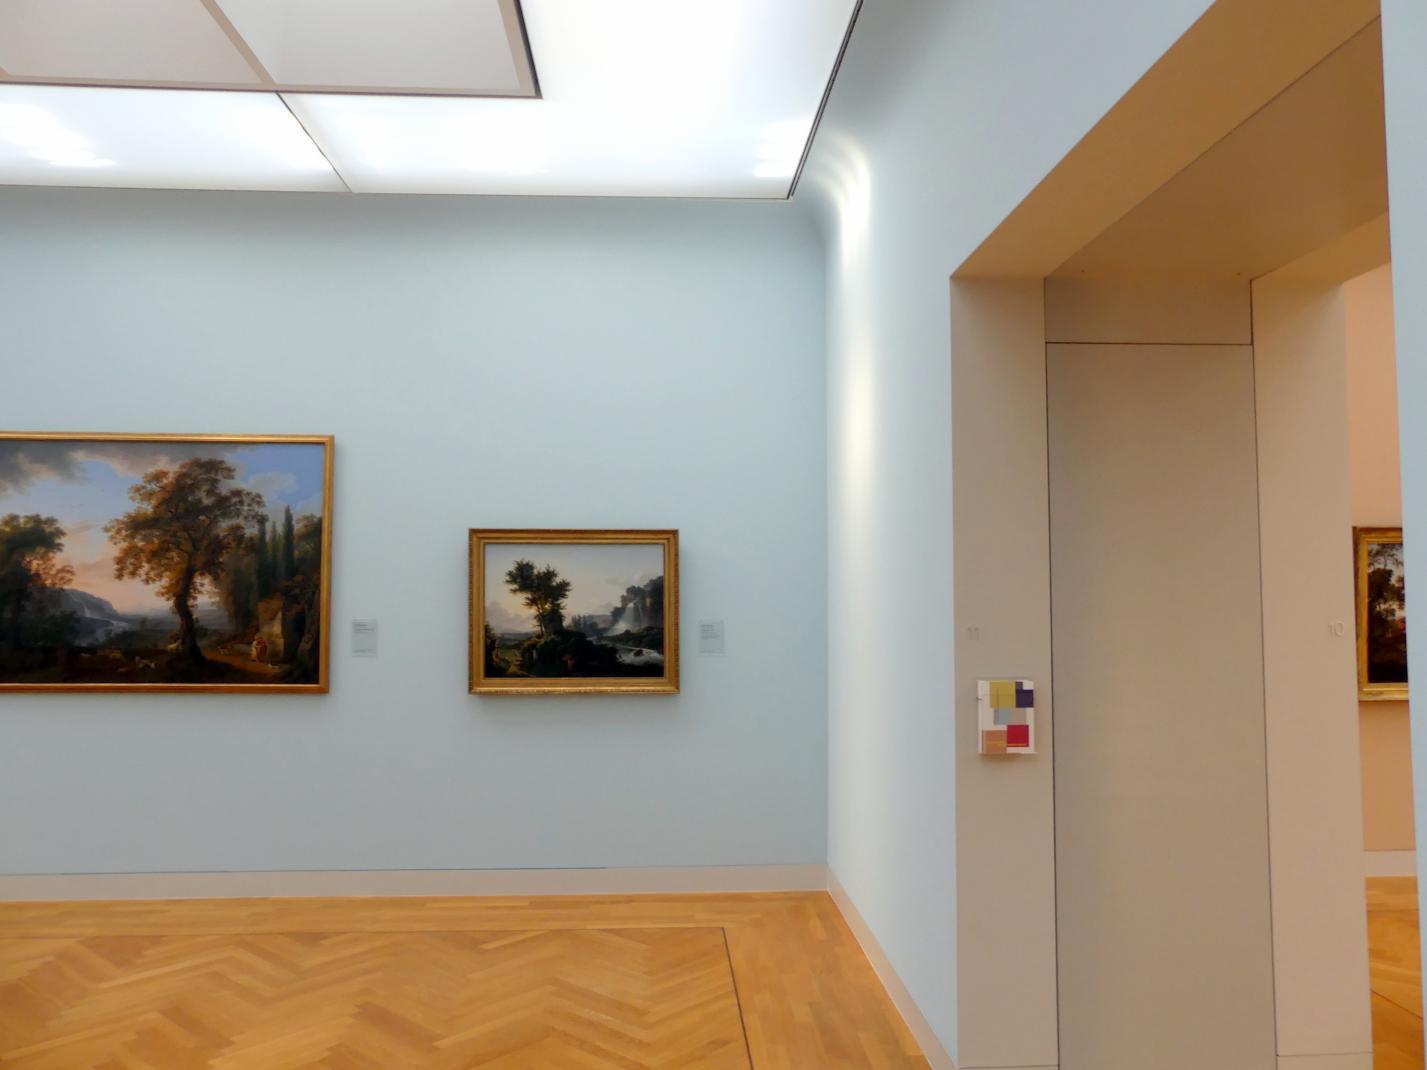 Schweinfurt, Museum Georg Schäfer, Saal 11, Bild 4/4